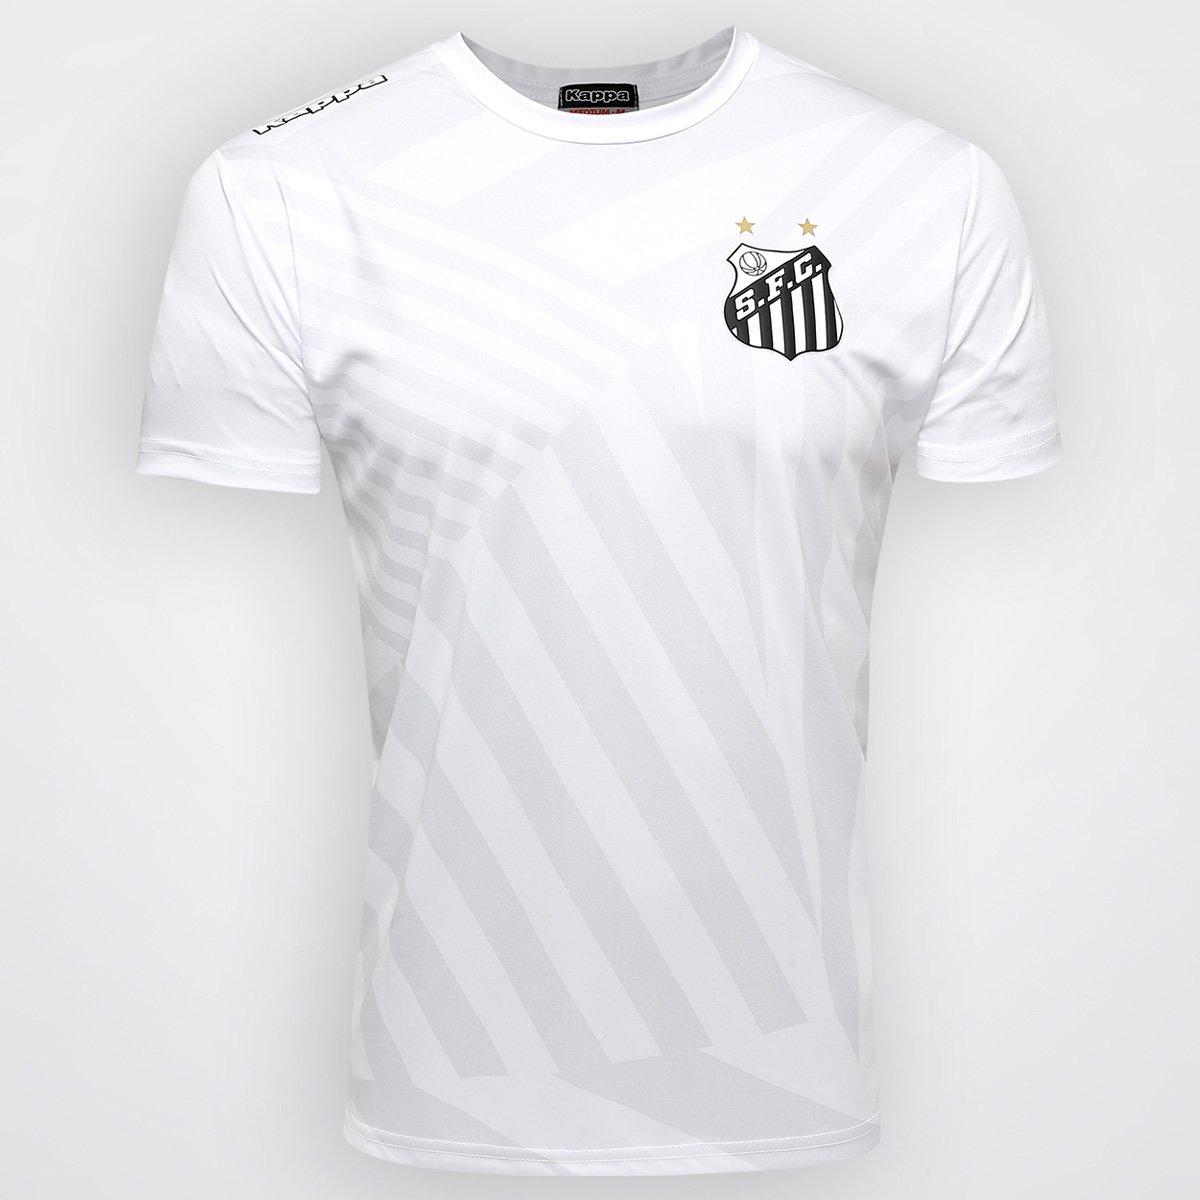 Camiseta Kappa Santos Force 2016 - Compre Agora  131bf080de220